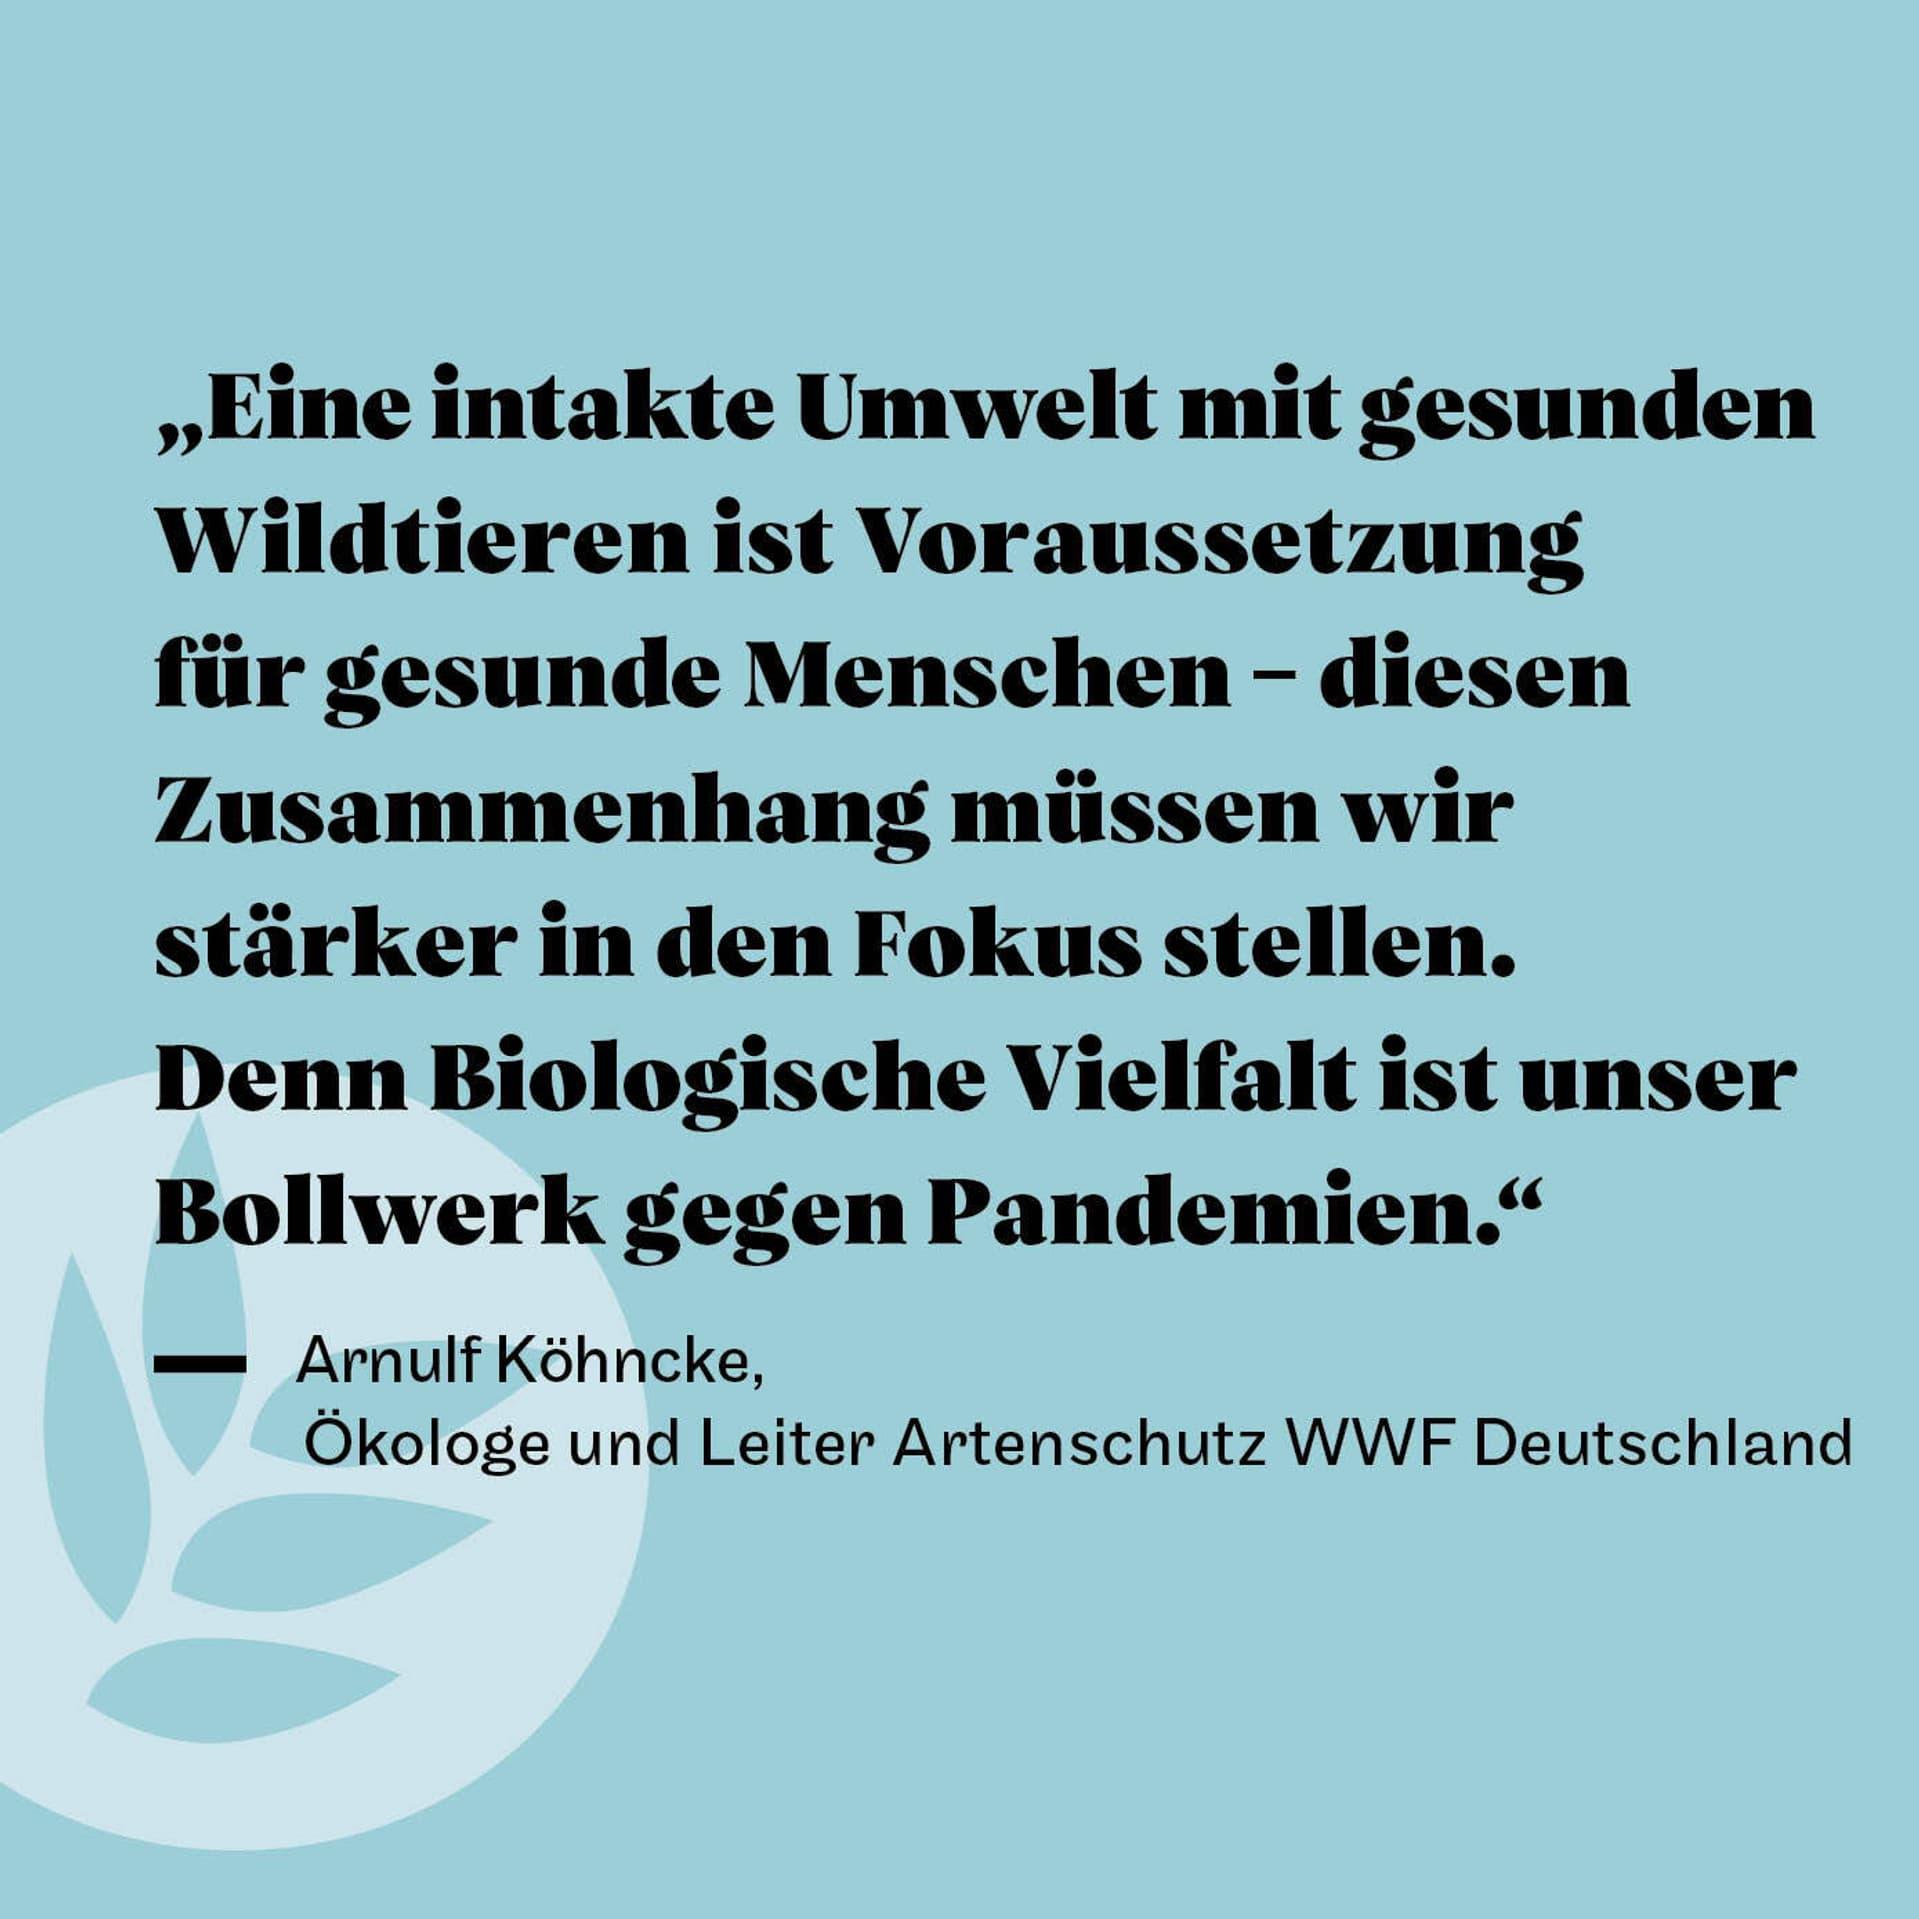 Arnulf Köhncke Zitat